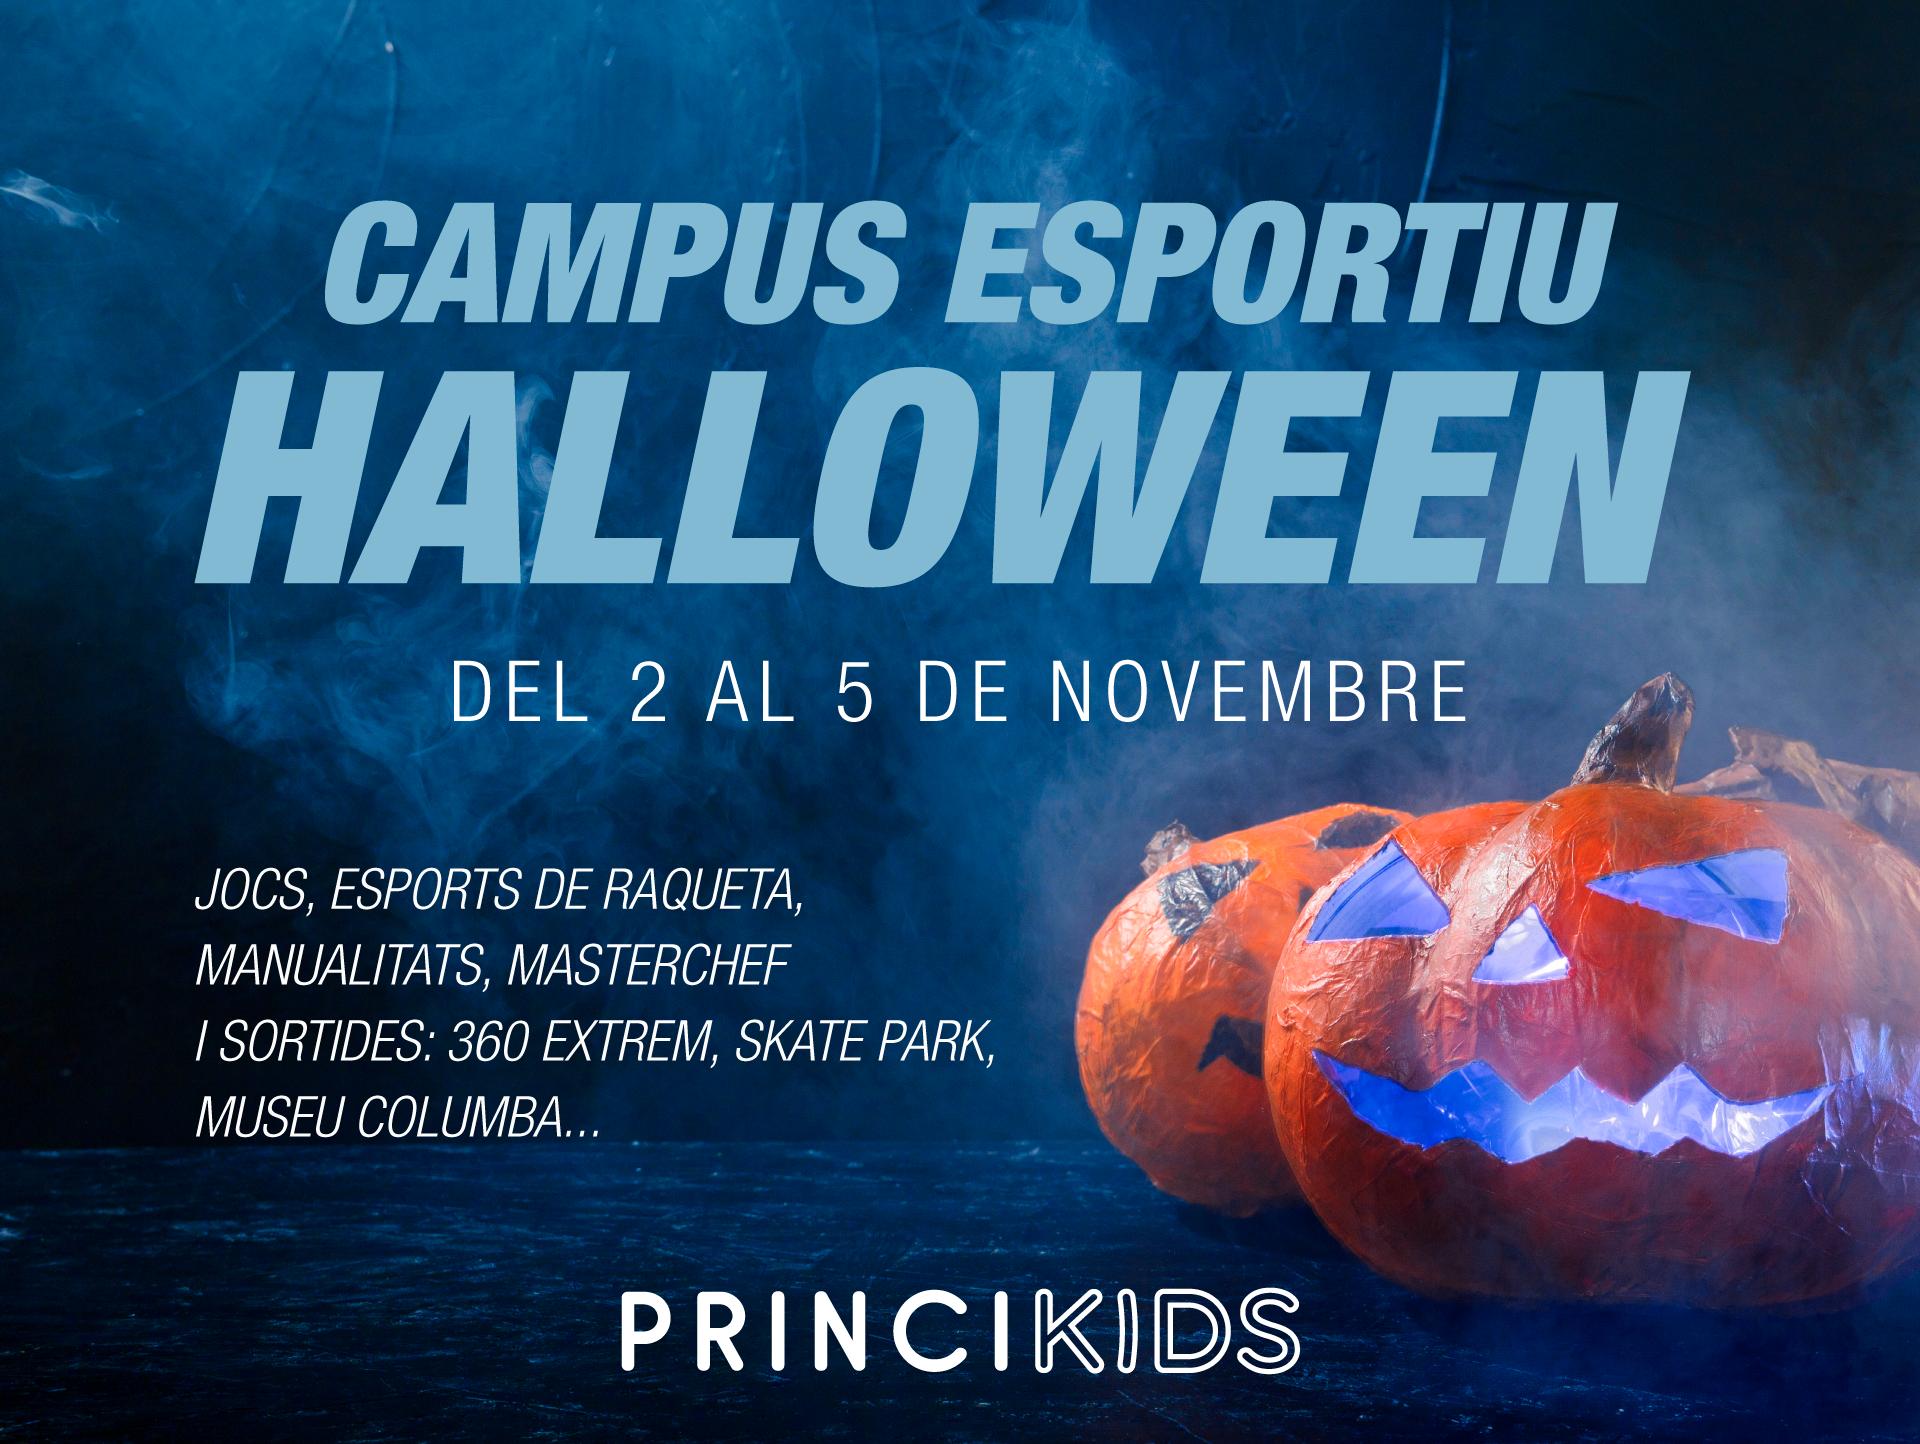 Campus Esportiu de Halloween 2021